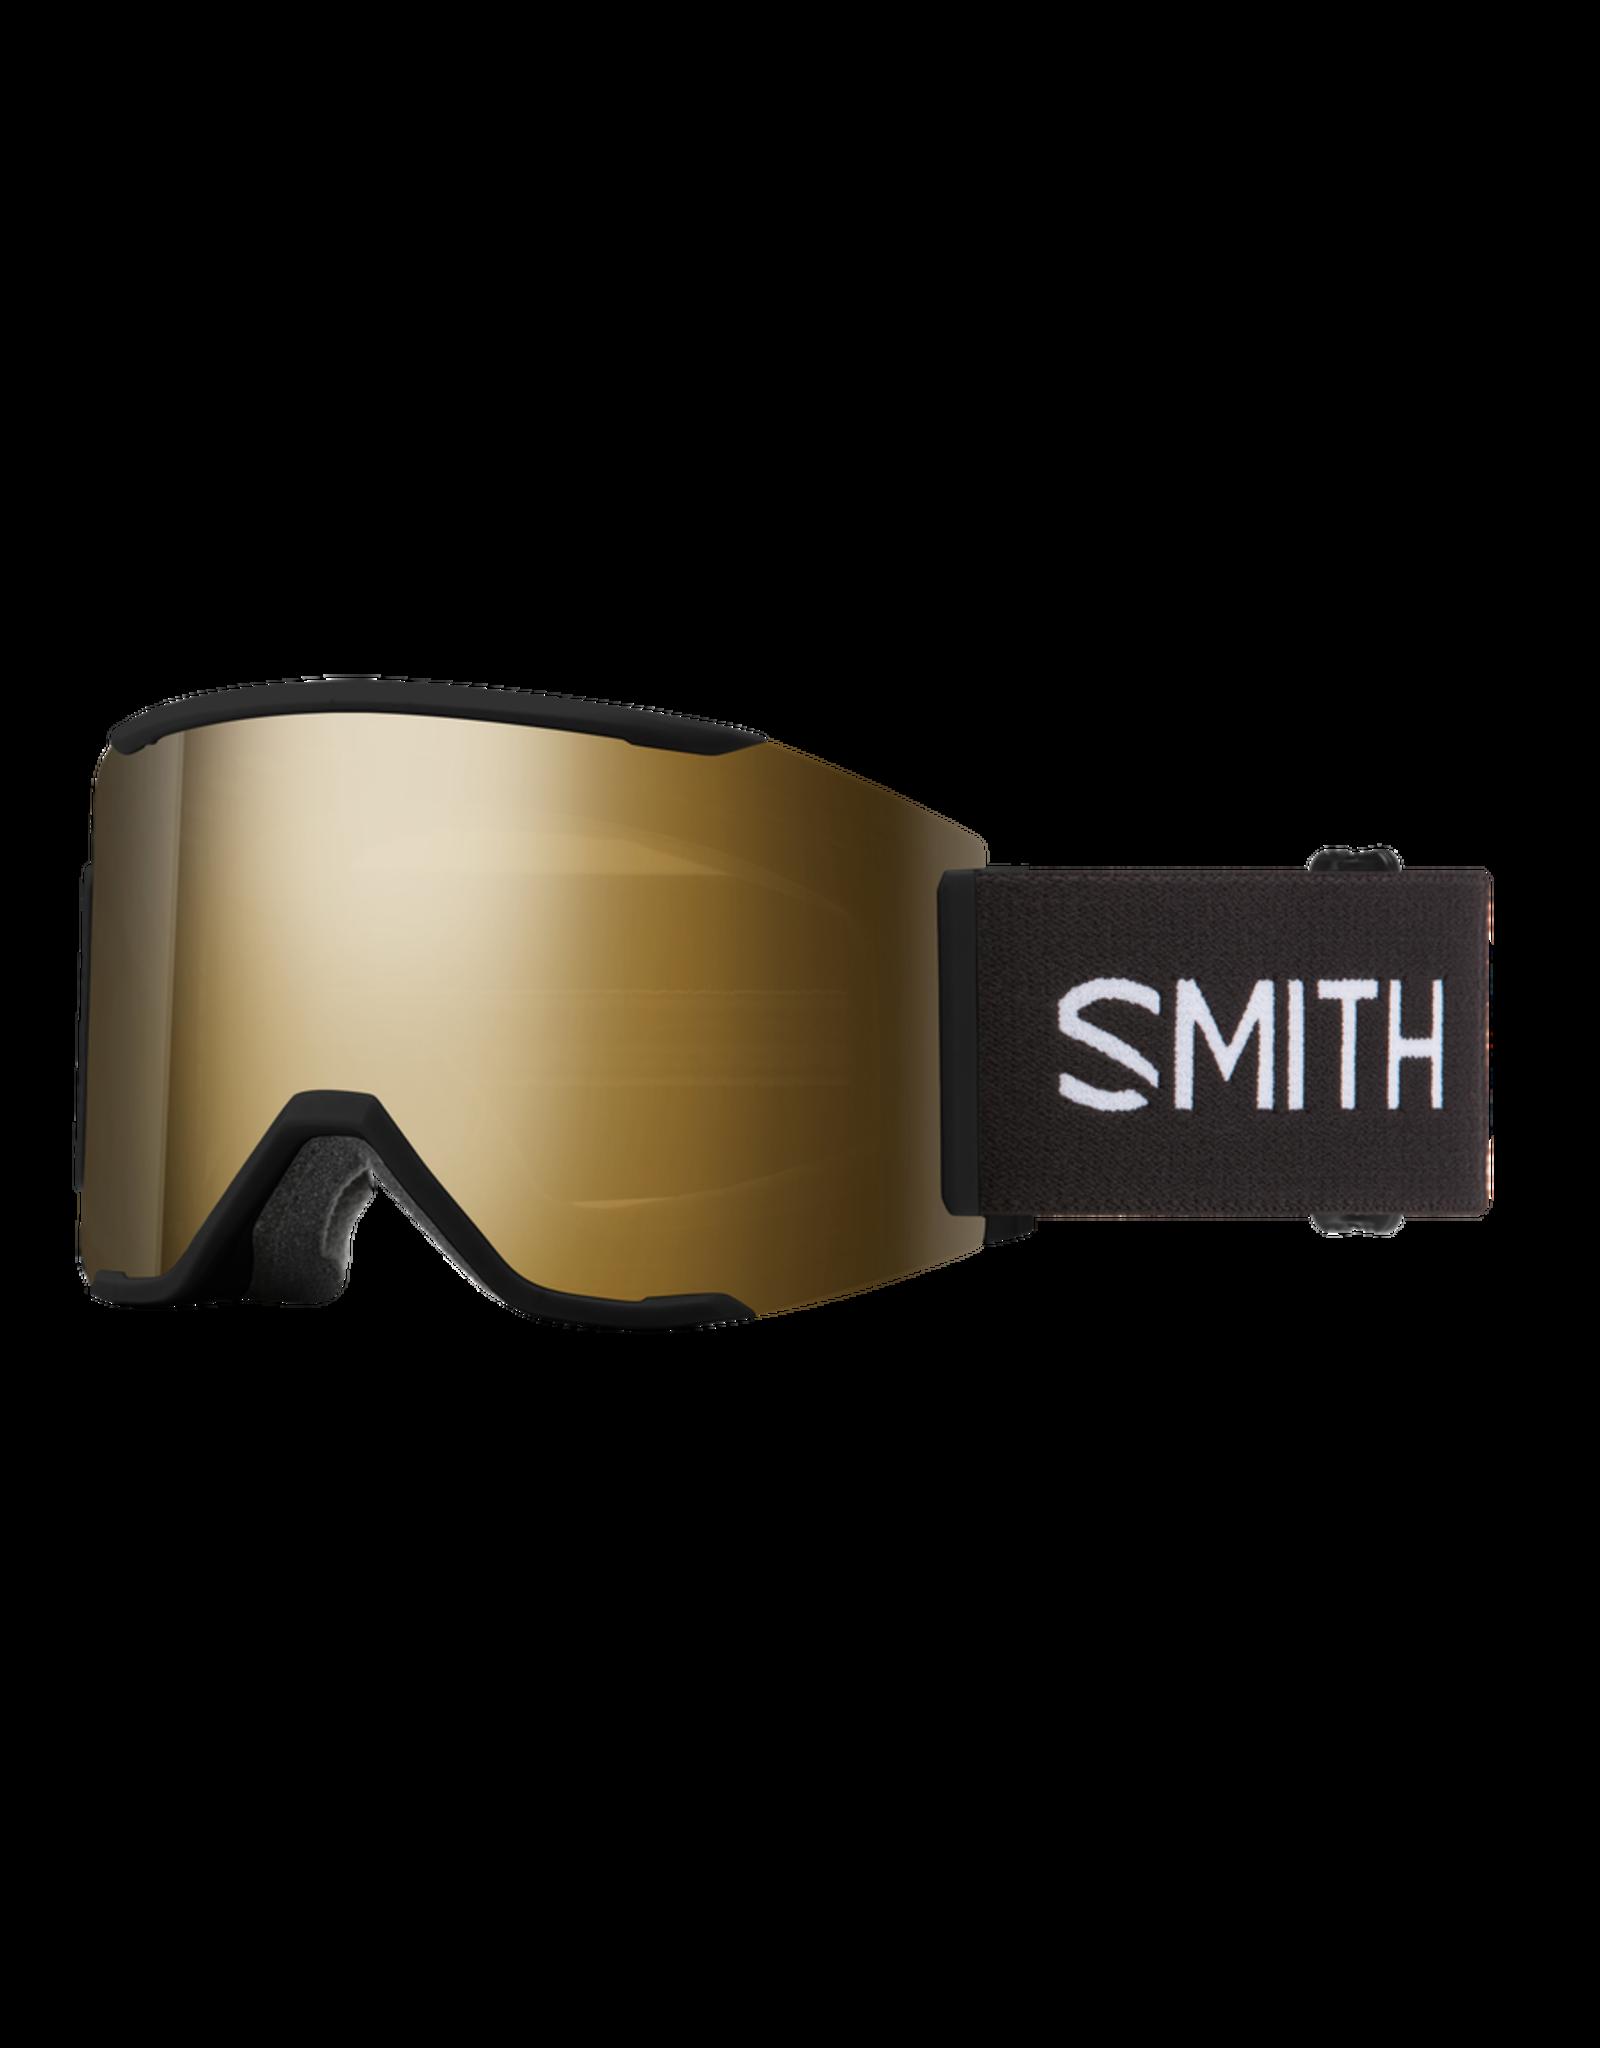 SMITH SQUAD XL BLACK SUN BLACK GOLD MIRROR